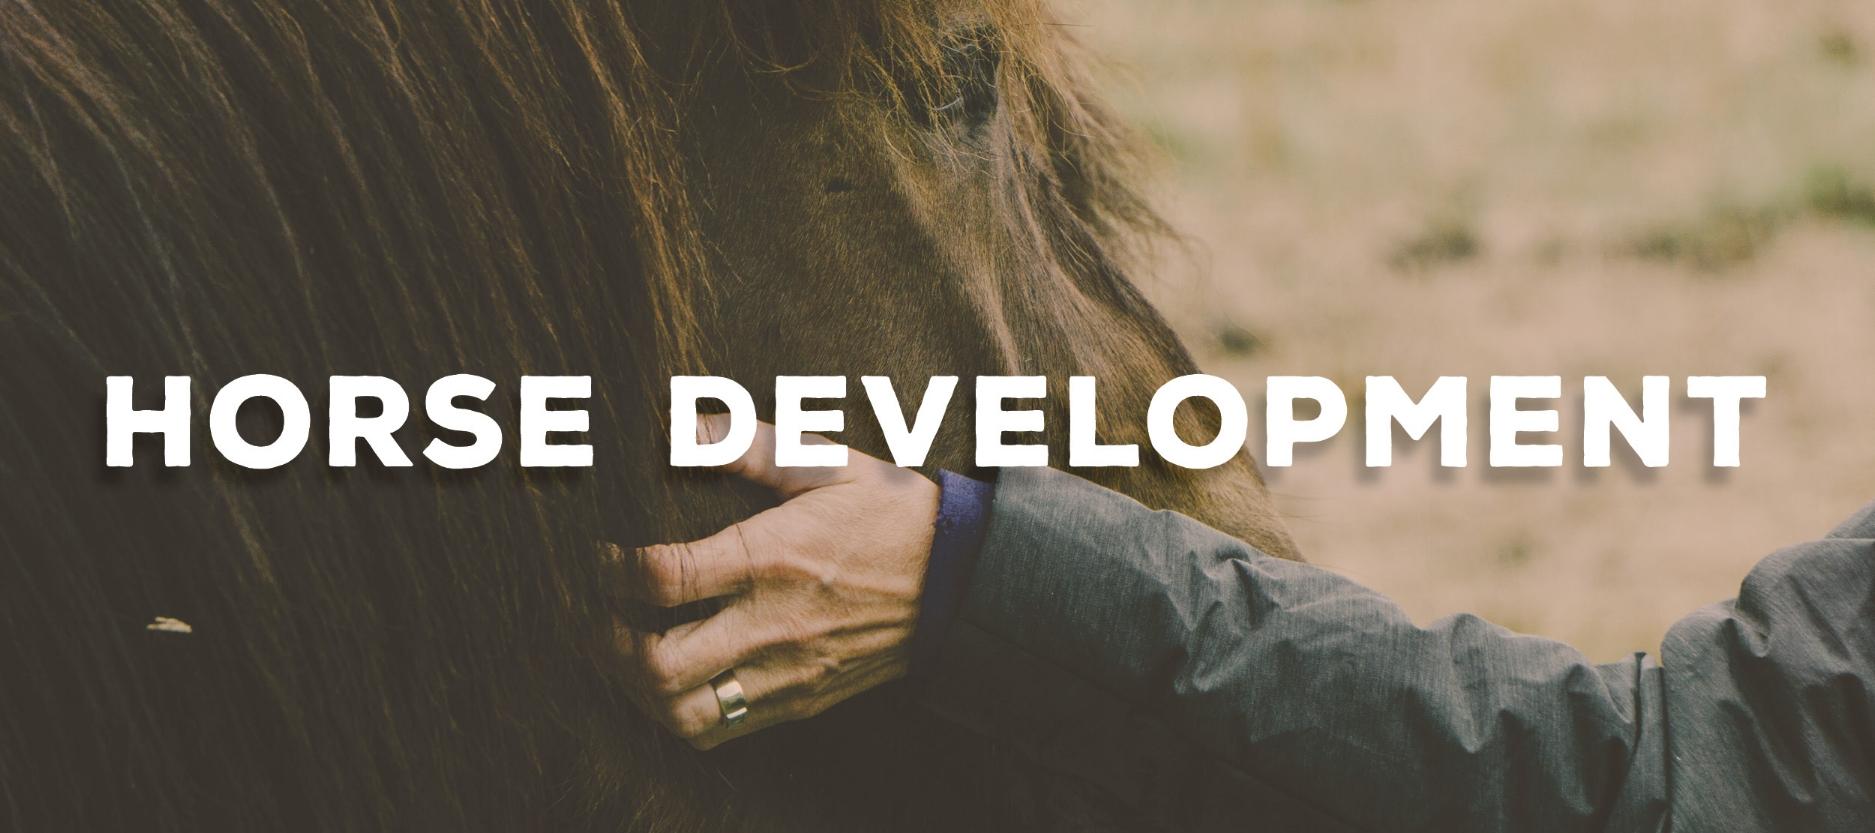 Horse Development Horsemanship Lessons Anderson Upstate